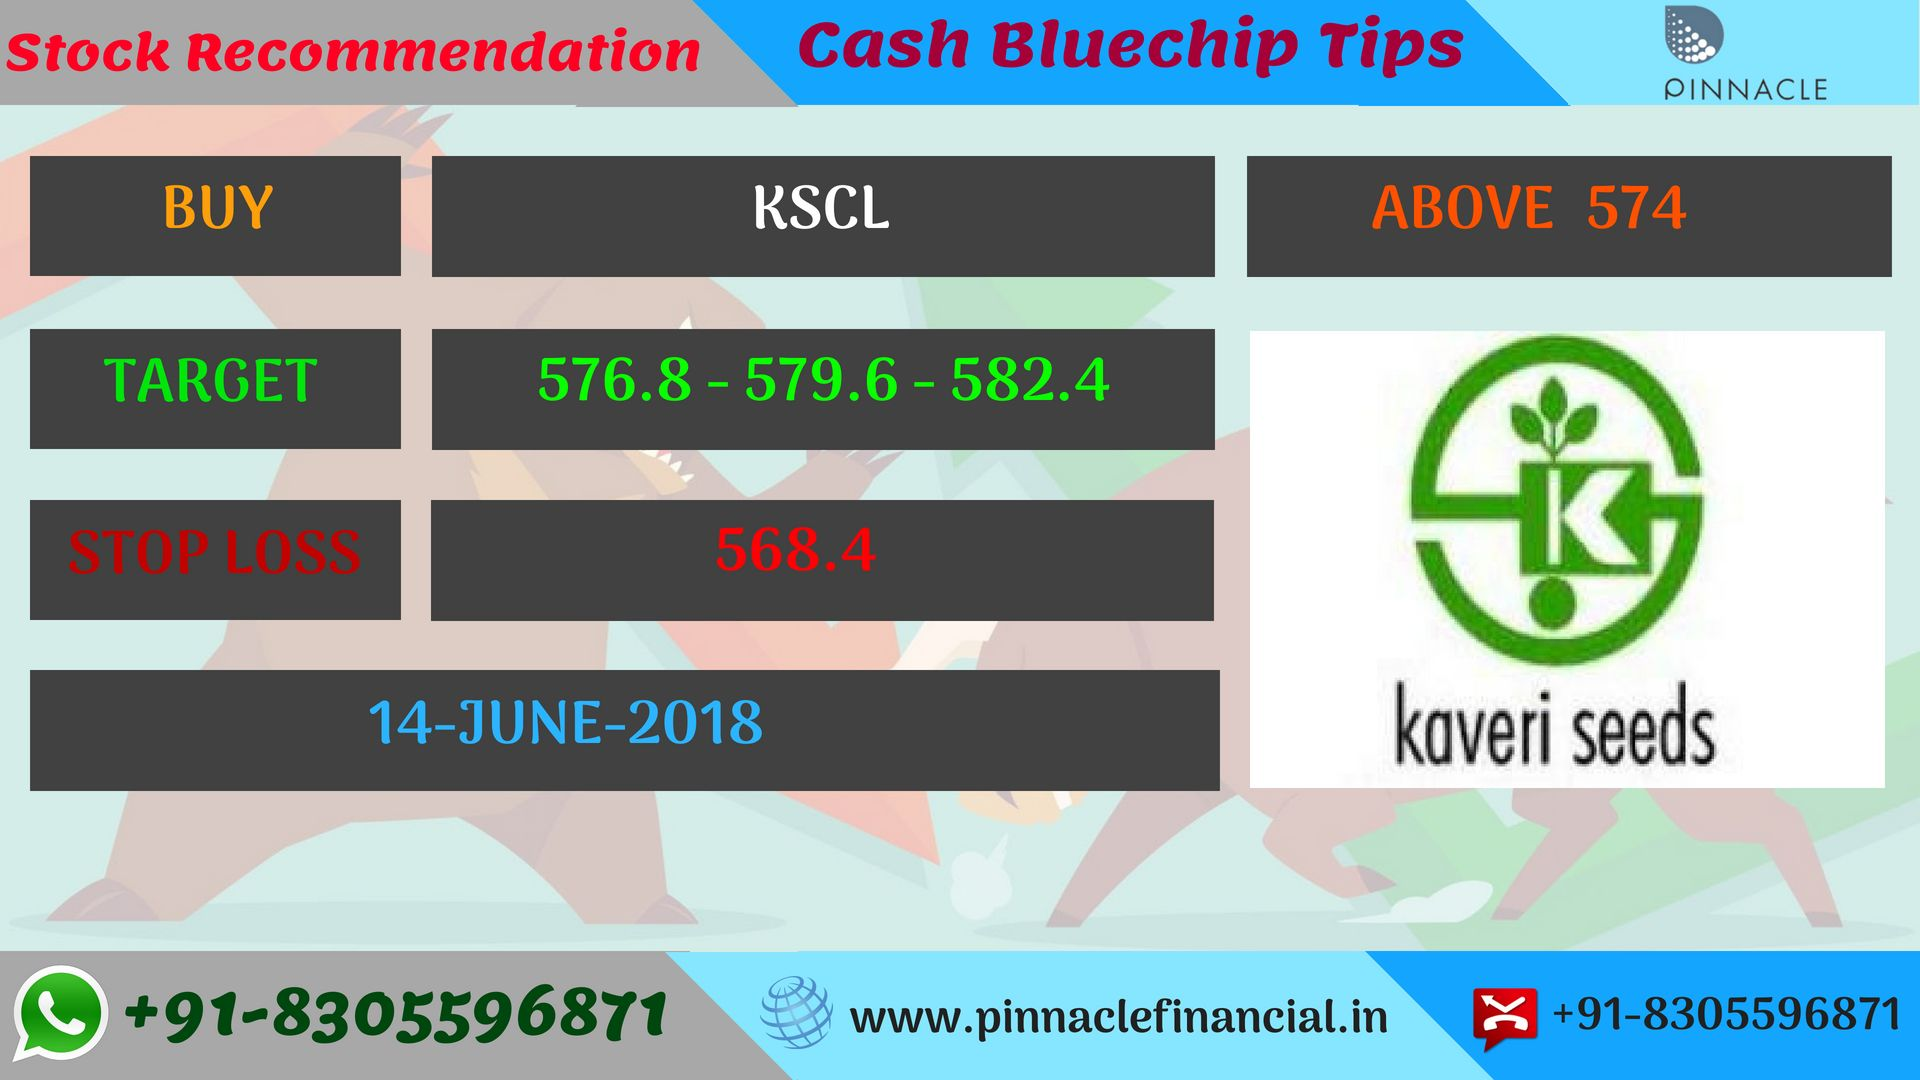 Stock Recommendation Commoditytips Intradaycalls Sharemarketips Beststockadvisory India Freecommoditytips Stocktips Mcxc Investing Tips Marketing